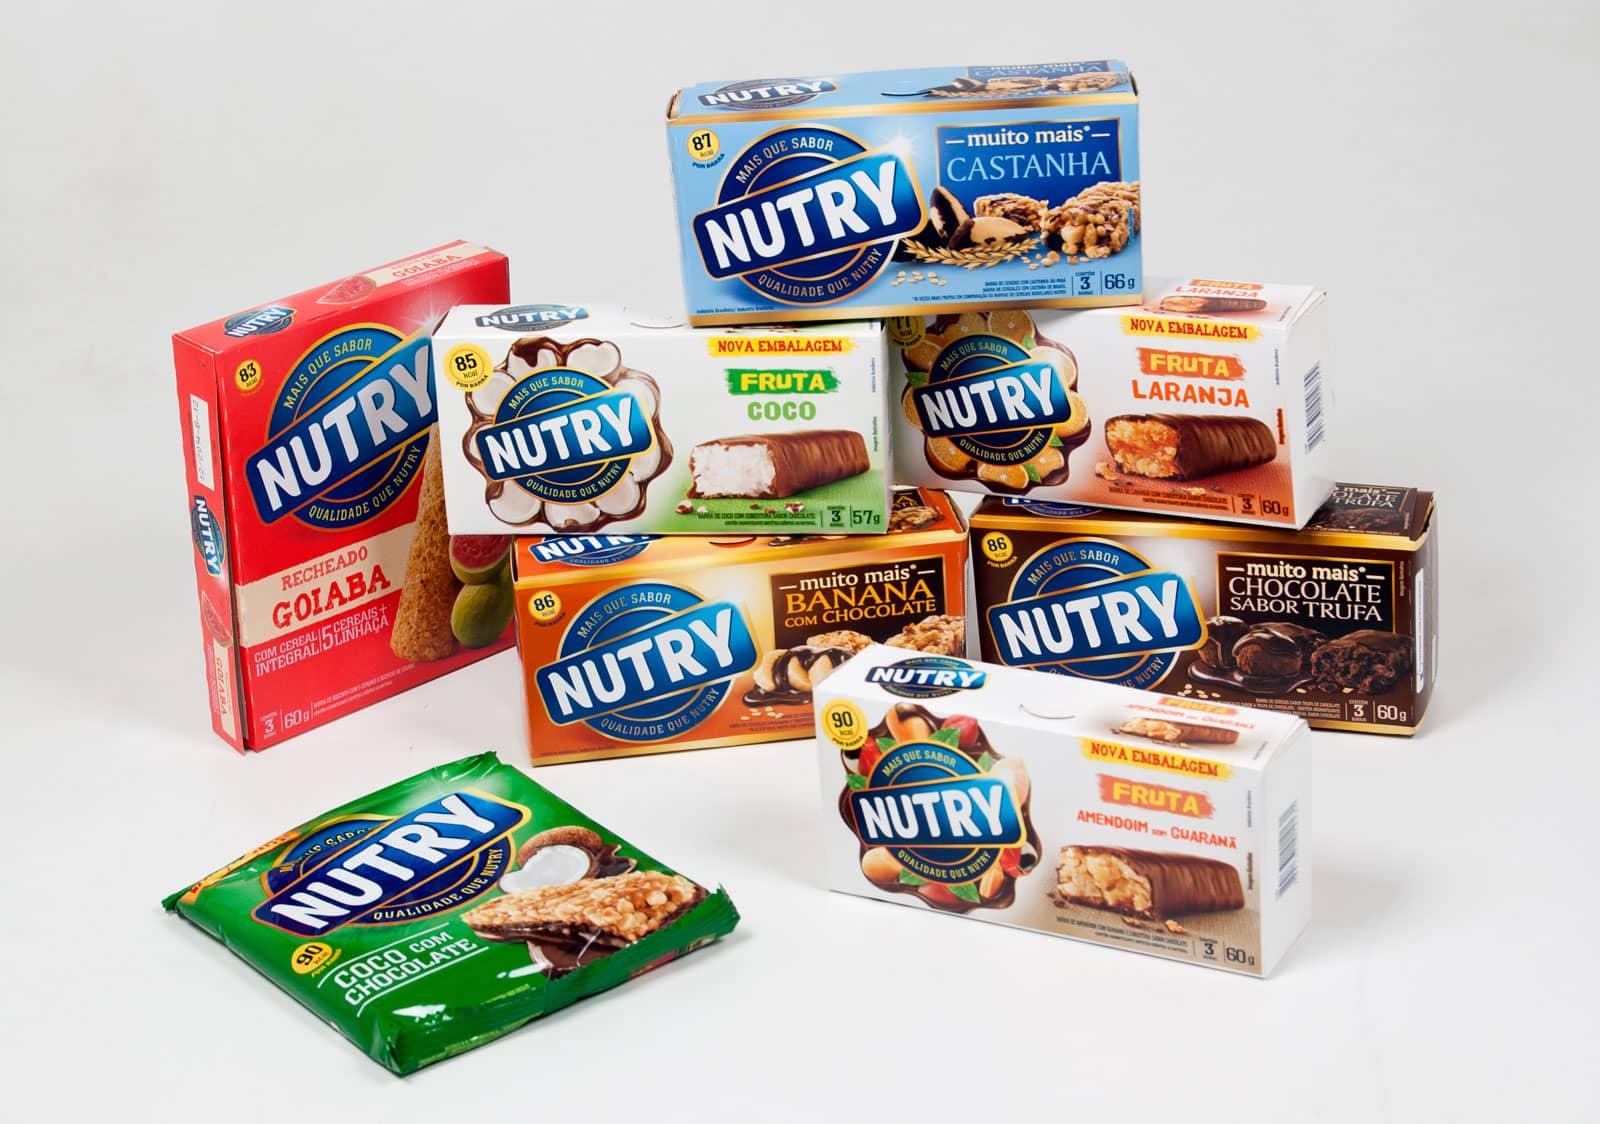 nutry-barras-frutas-chocolate